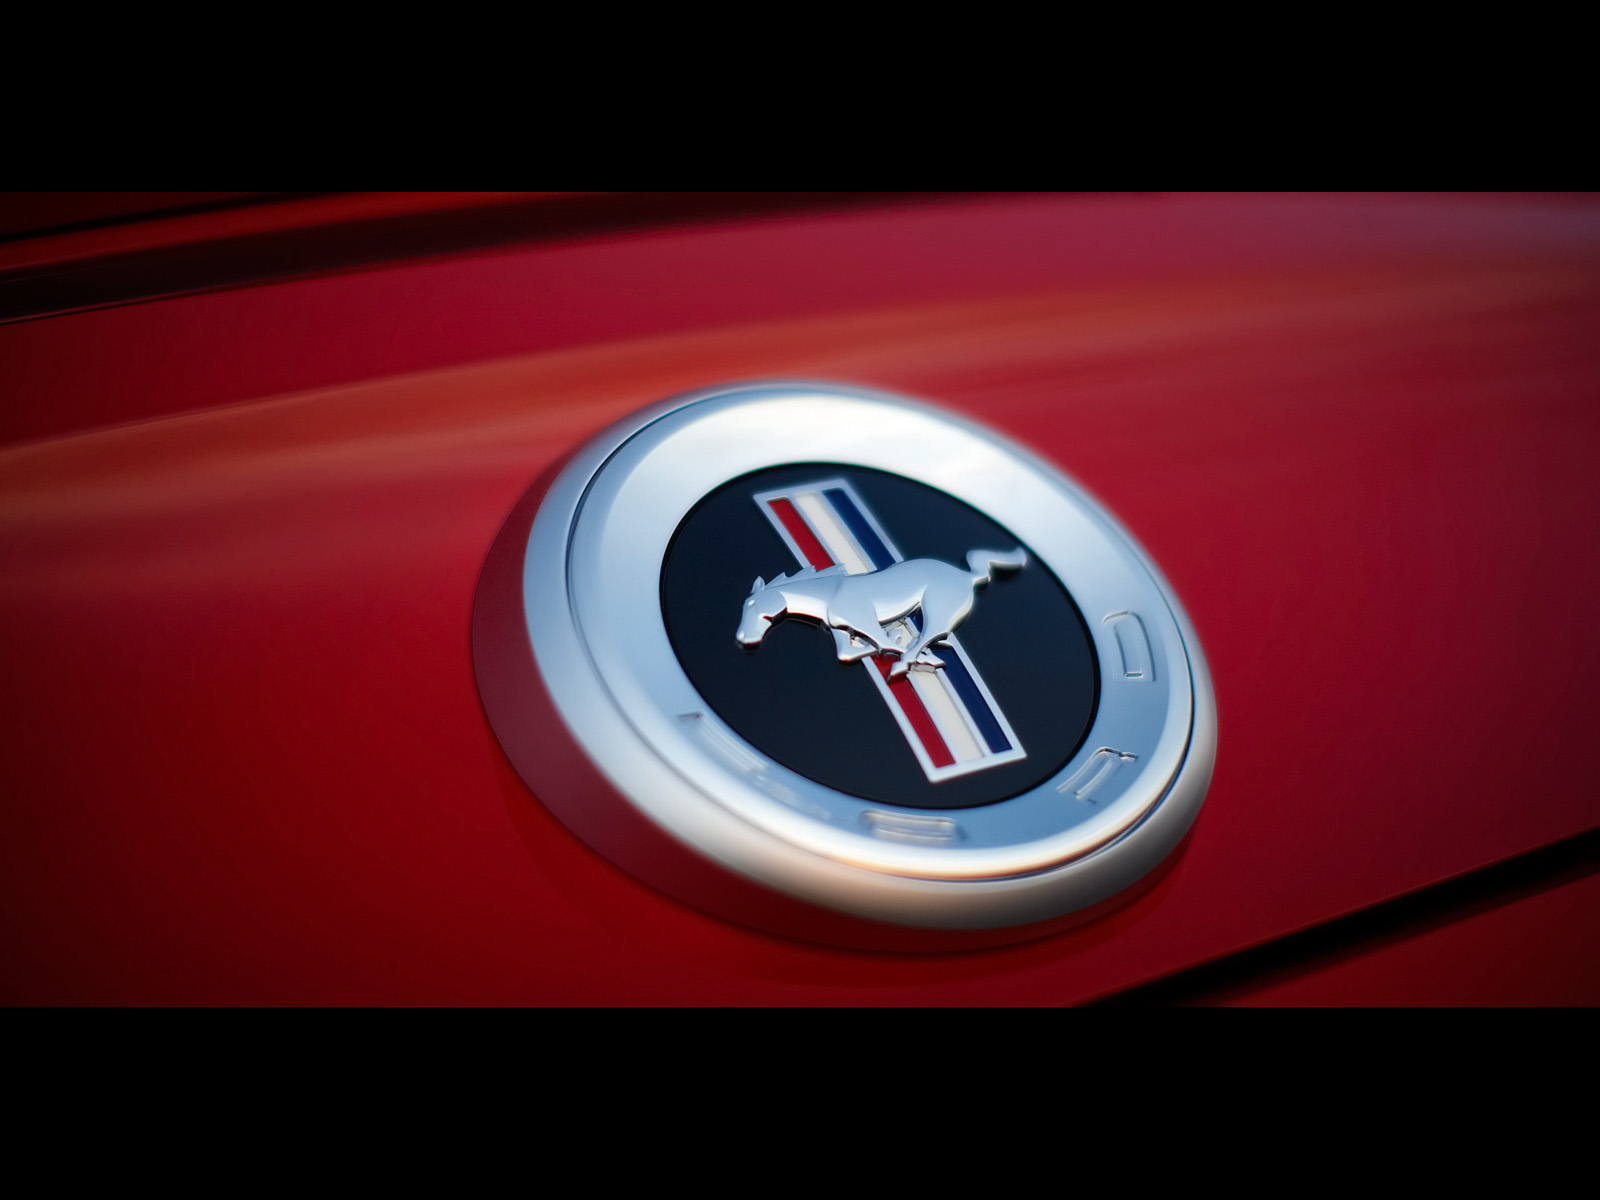 2010 Ford Mustang   Rear Emblem   1600x1200   Wallpaper 1600x1200